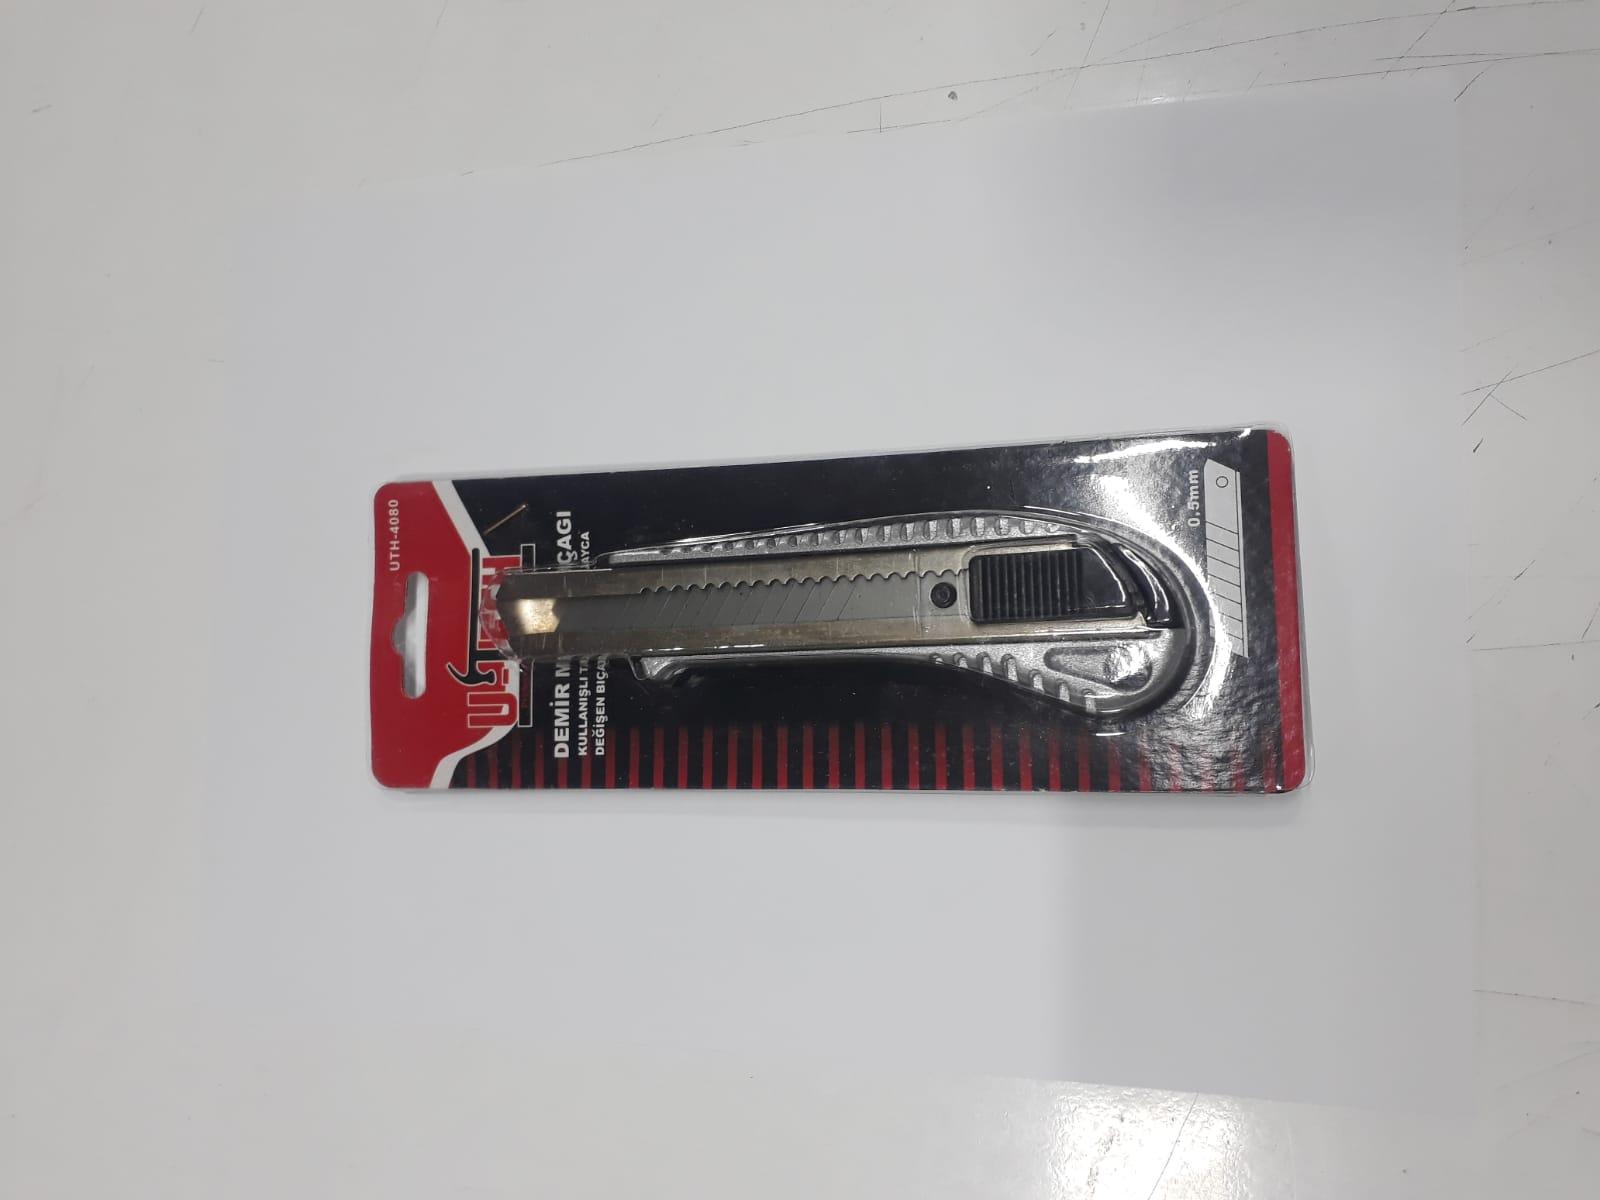 U-TECH UTH-4080 Maket Bıçağı (Falçata)